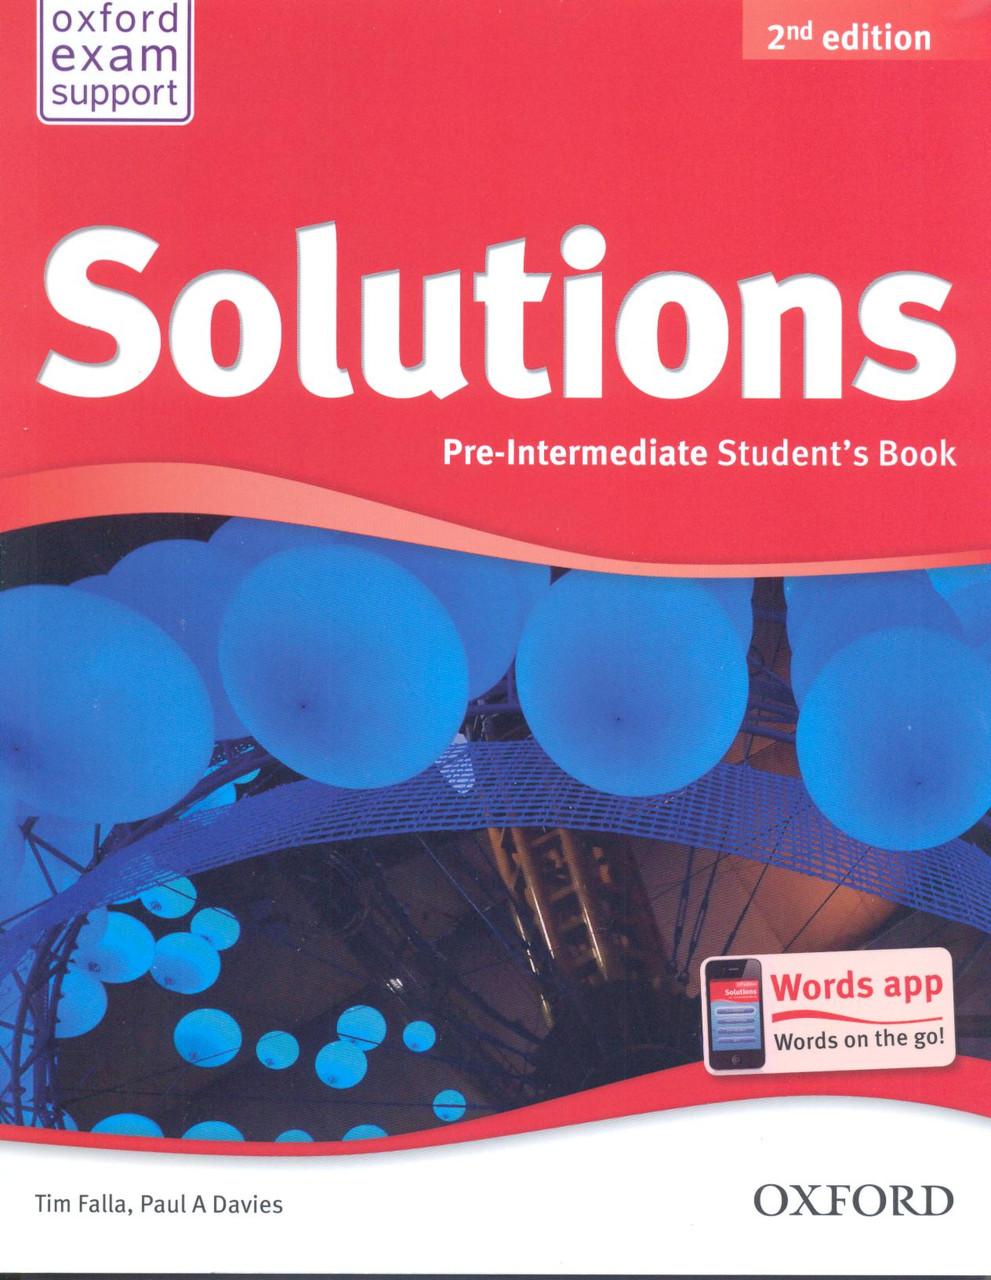 Скачать solutions pre-intermediate student's book.